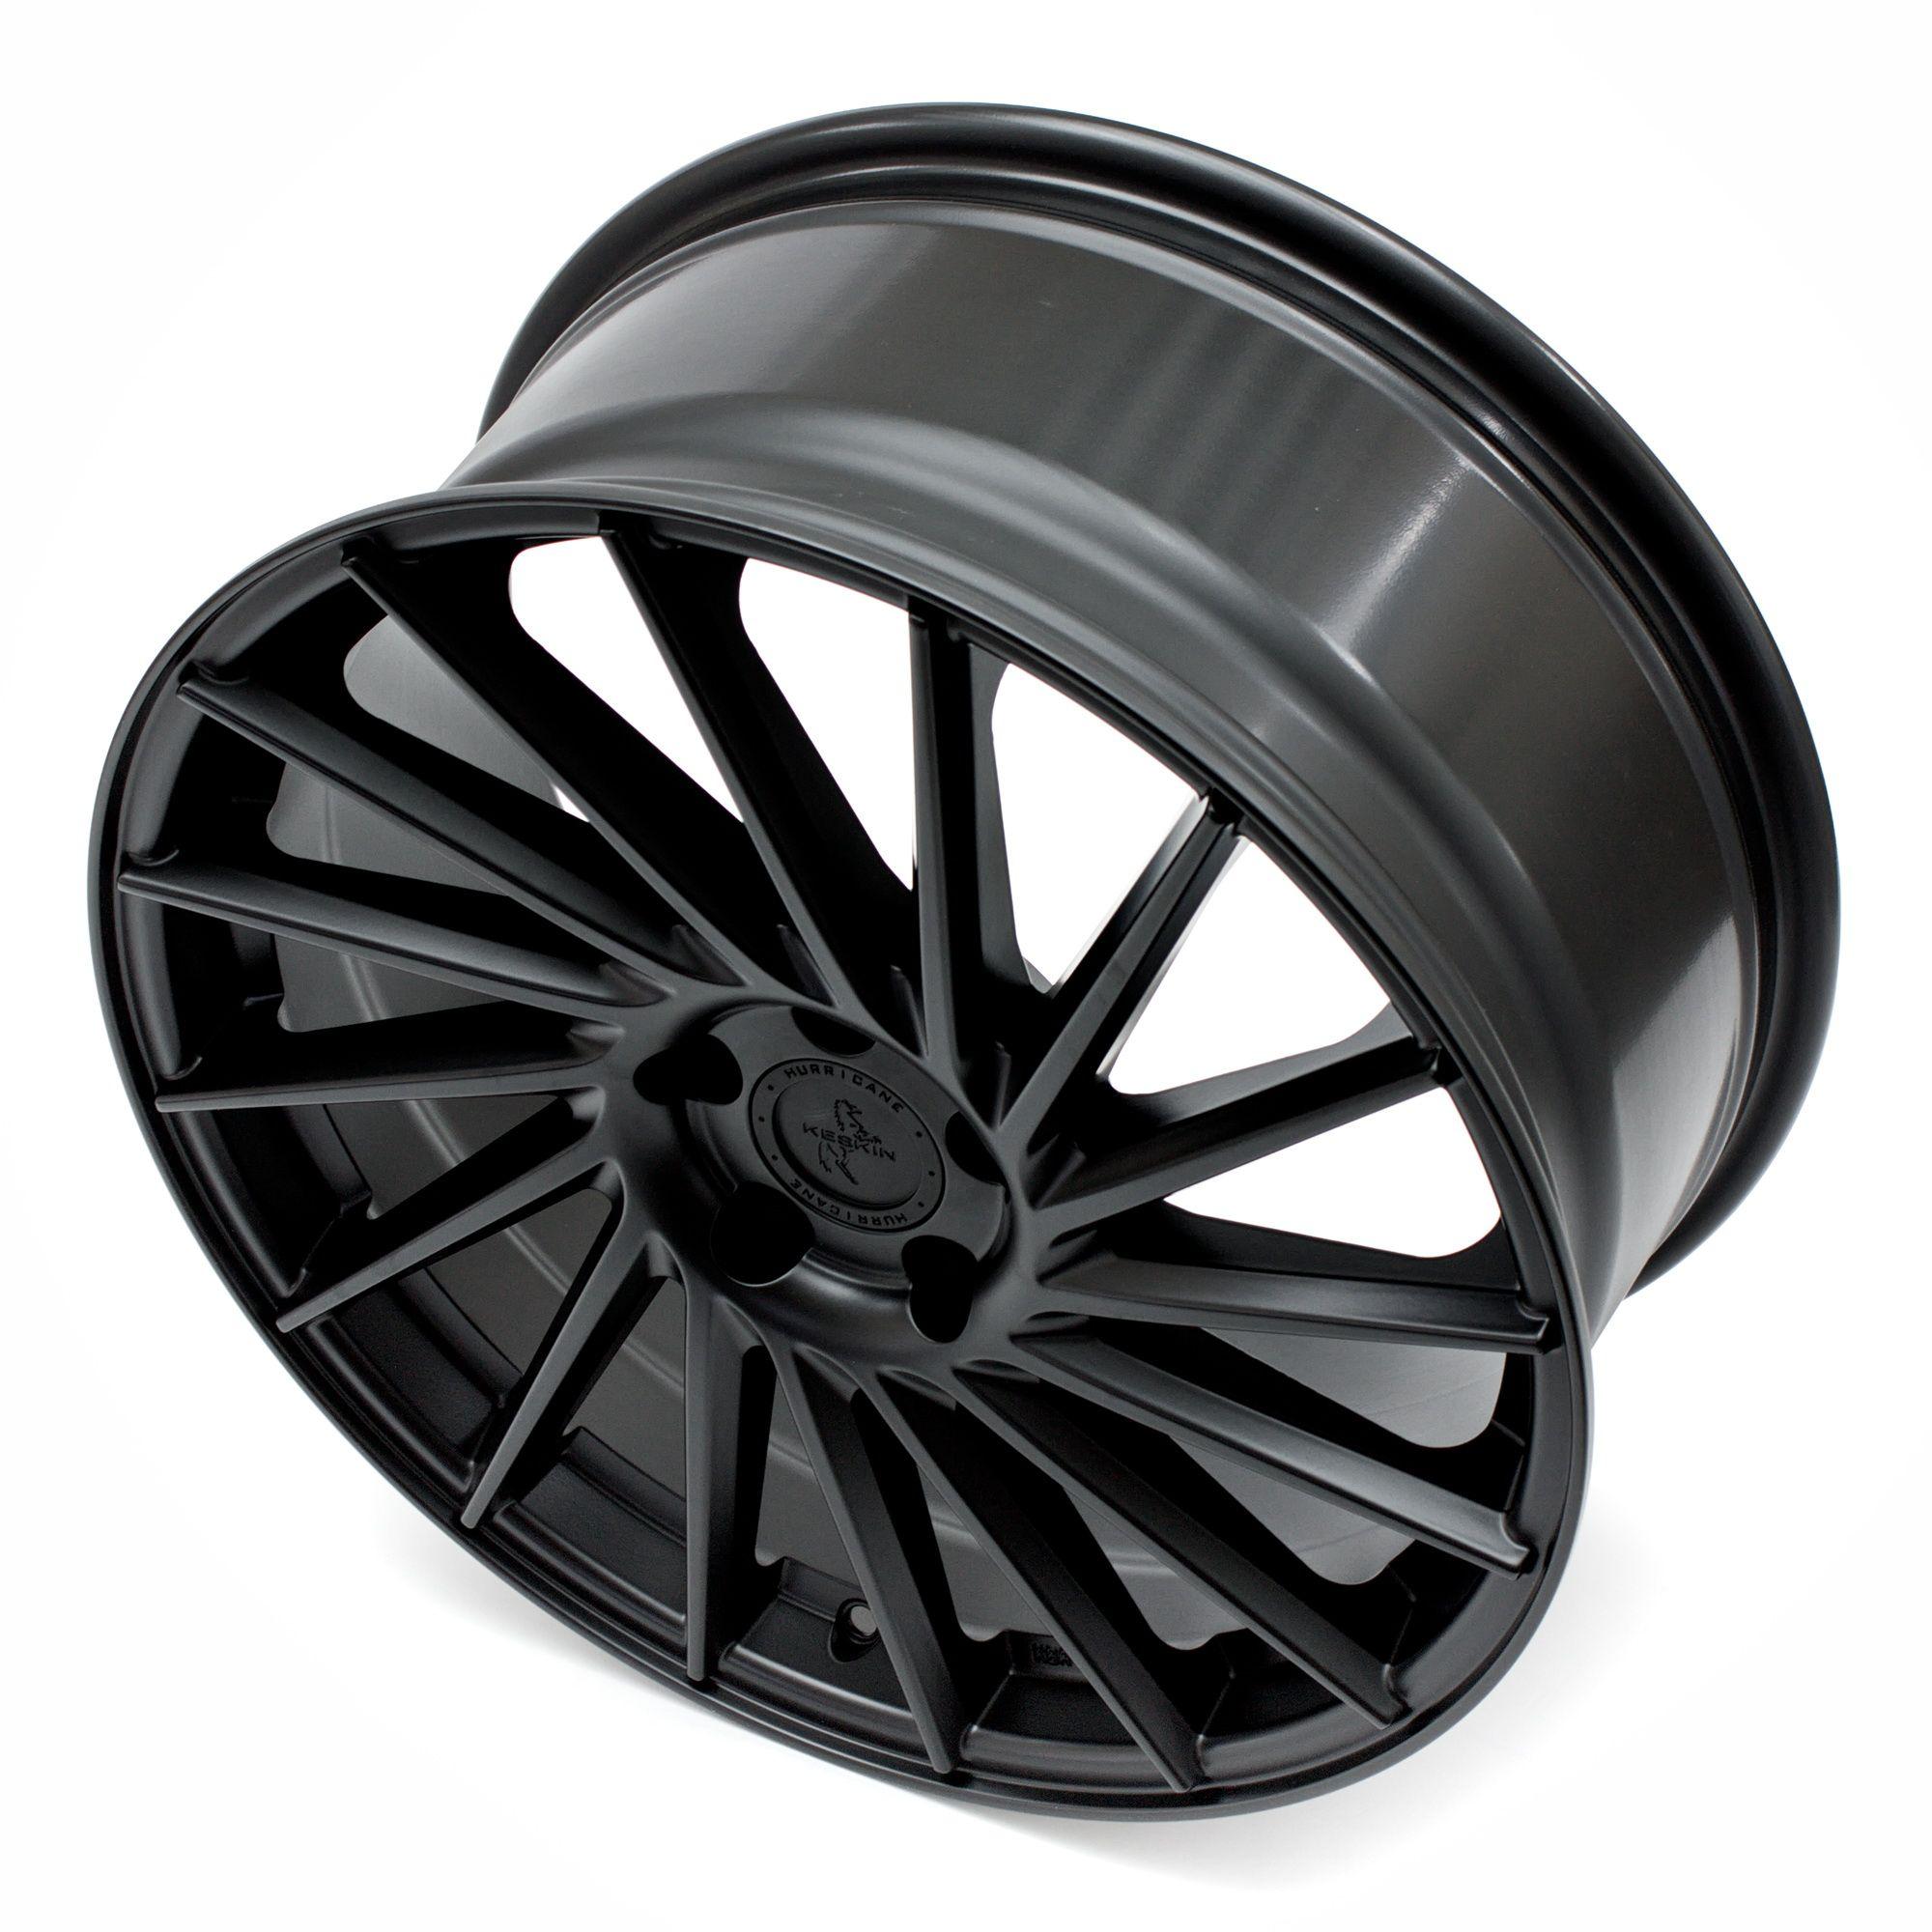 keskin kt17 felgen matt black painted schwarz in 22 zoll. Black Bedroom Furniture Sets. Home Design Ideas